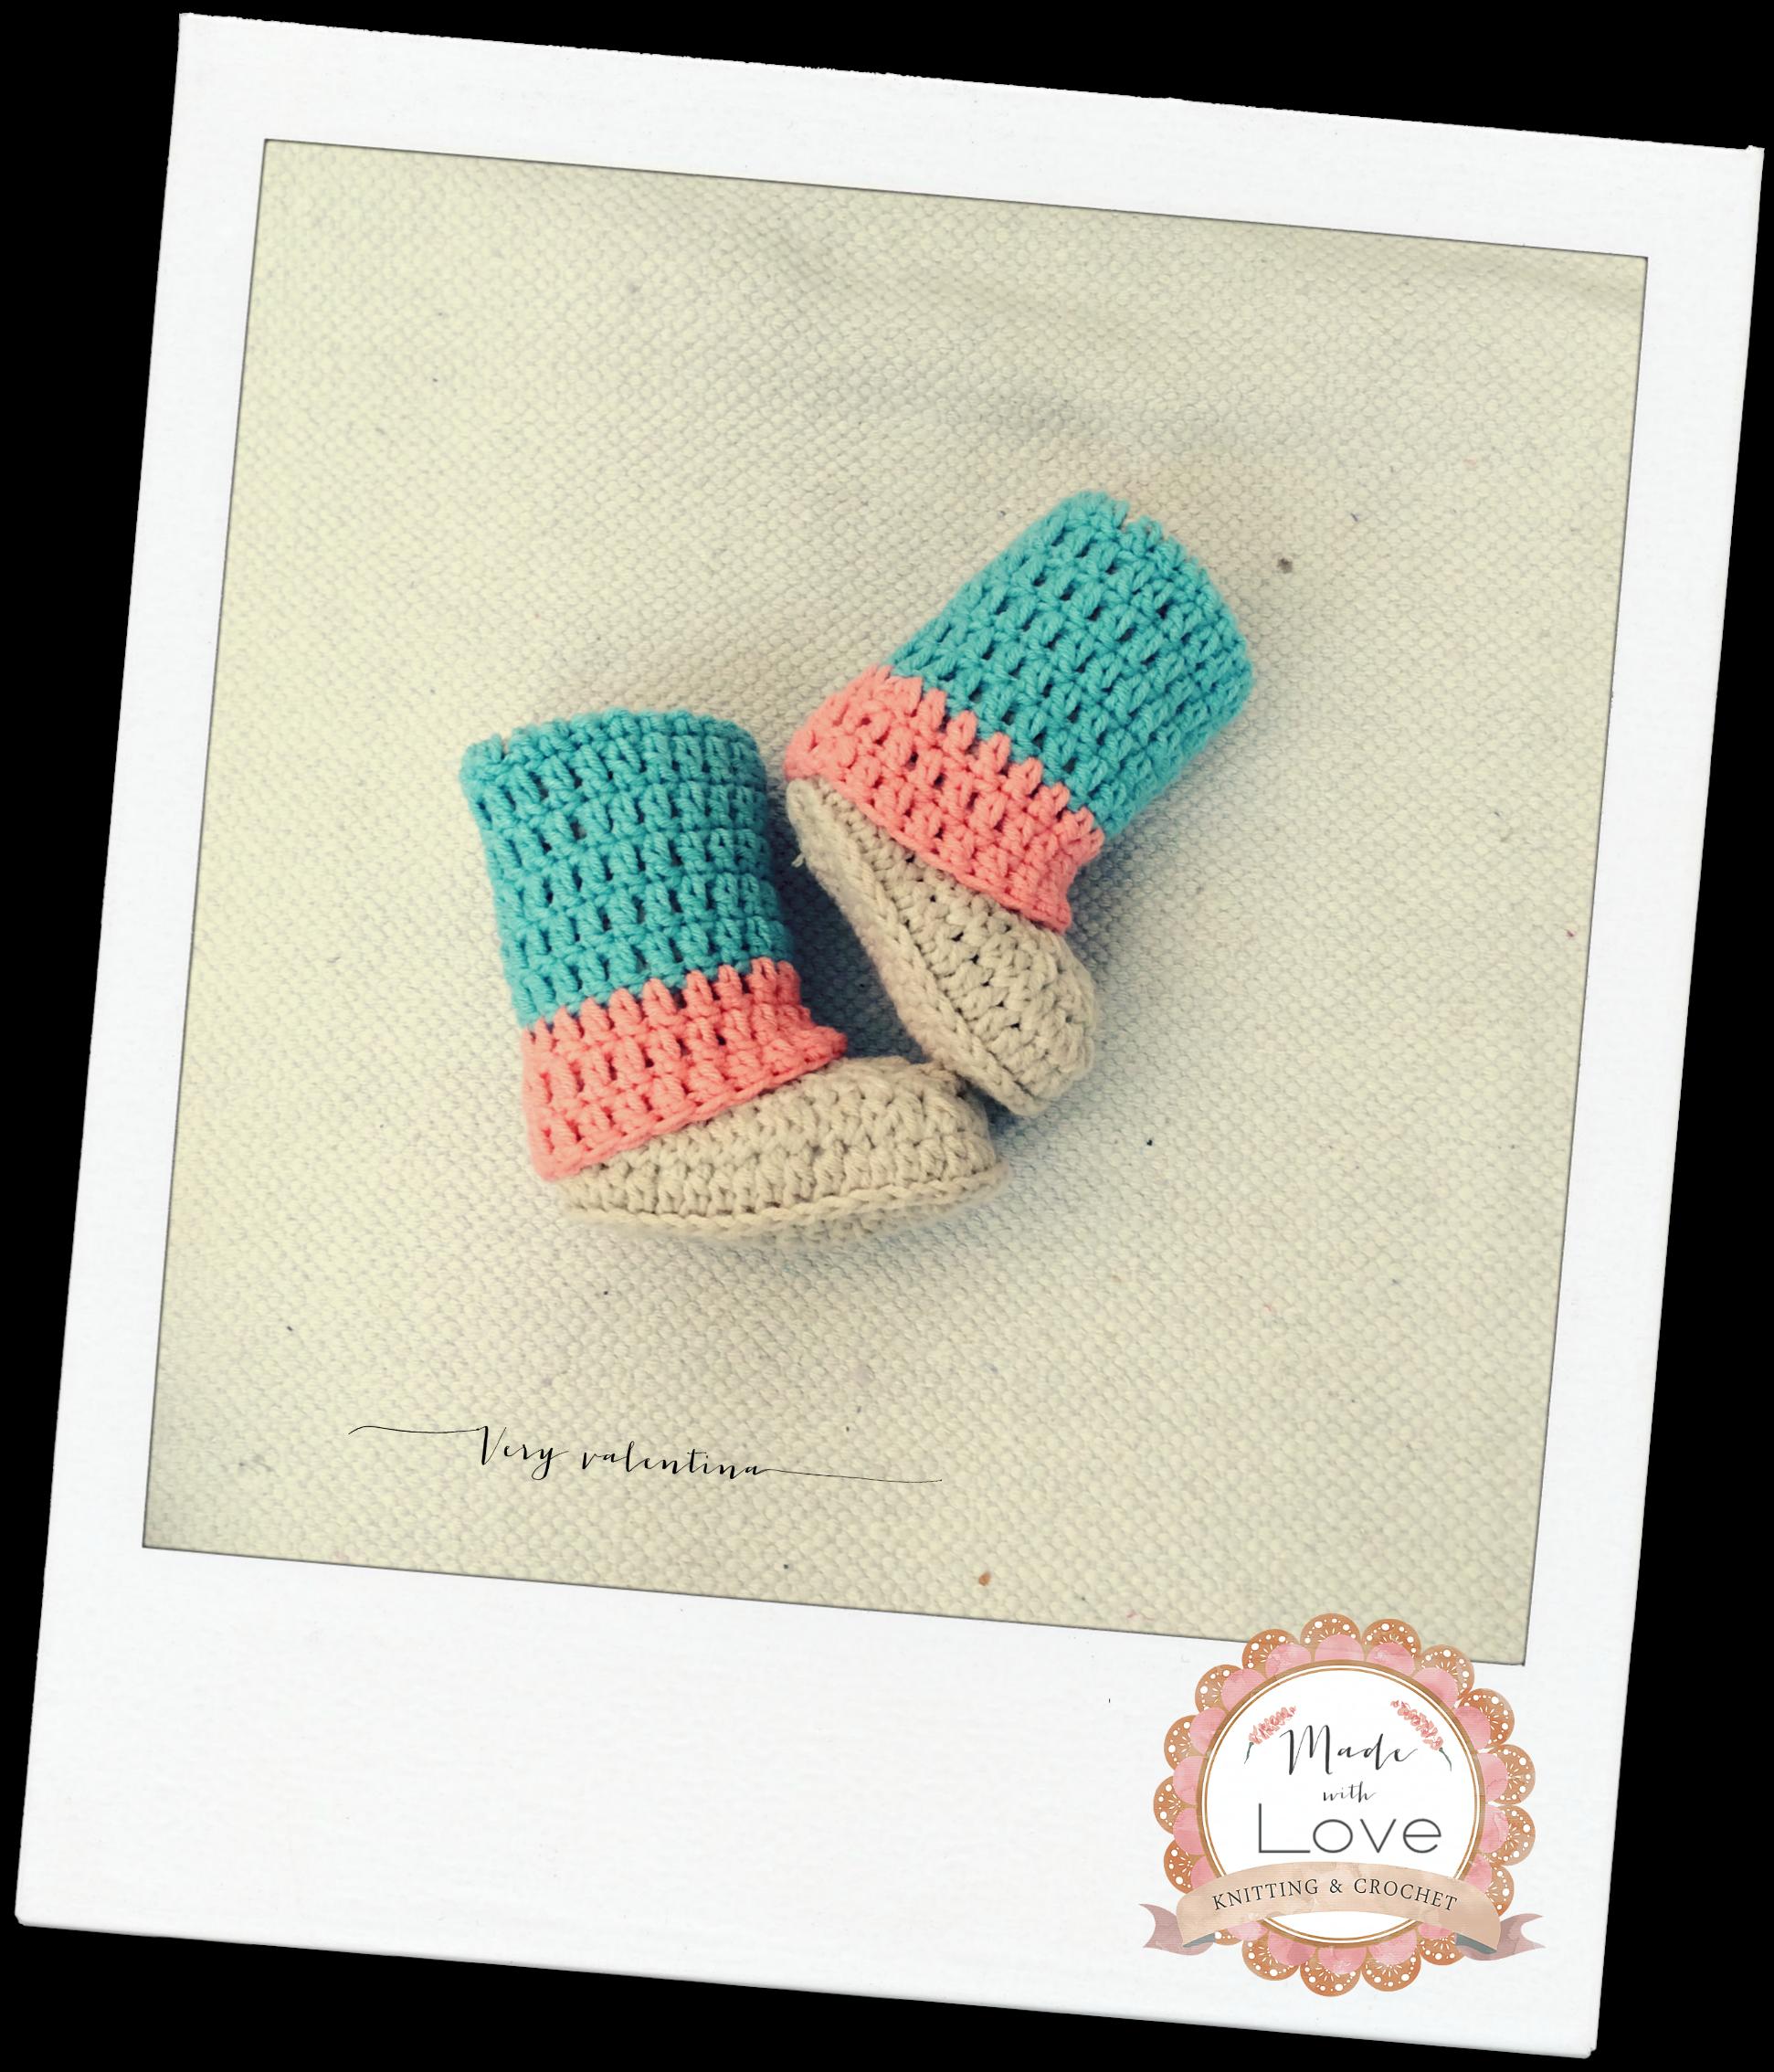 Crochet Baby Girl Legwarmer Shoes Uncinetto Scaldamuscoli Bimba Scarpette Handmade With Love Crochet Baby Crochet Baby Girl Baby Knitting